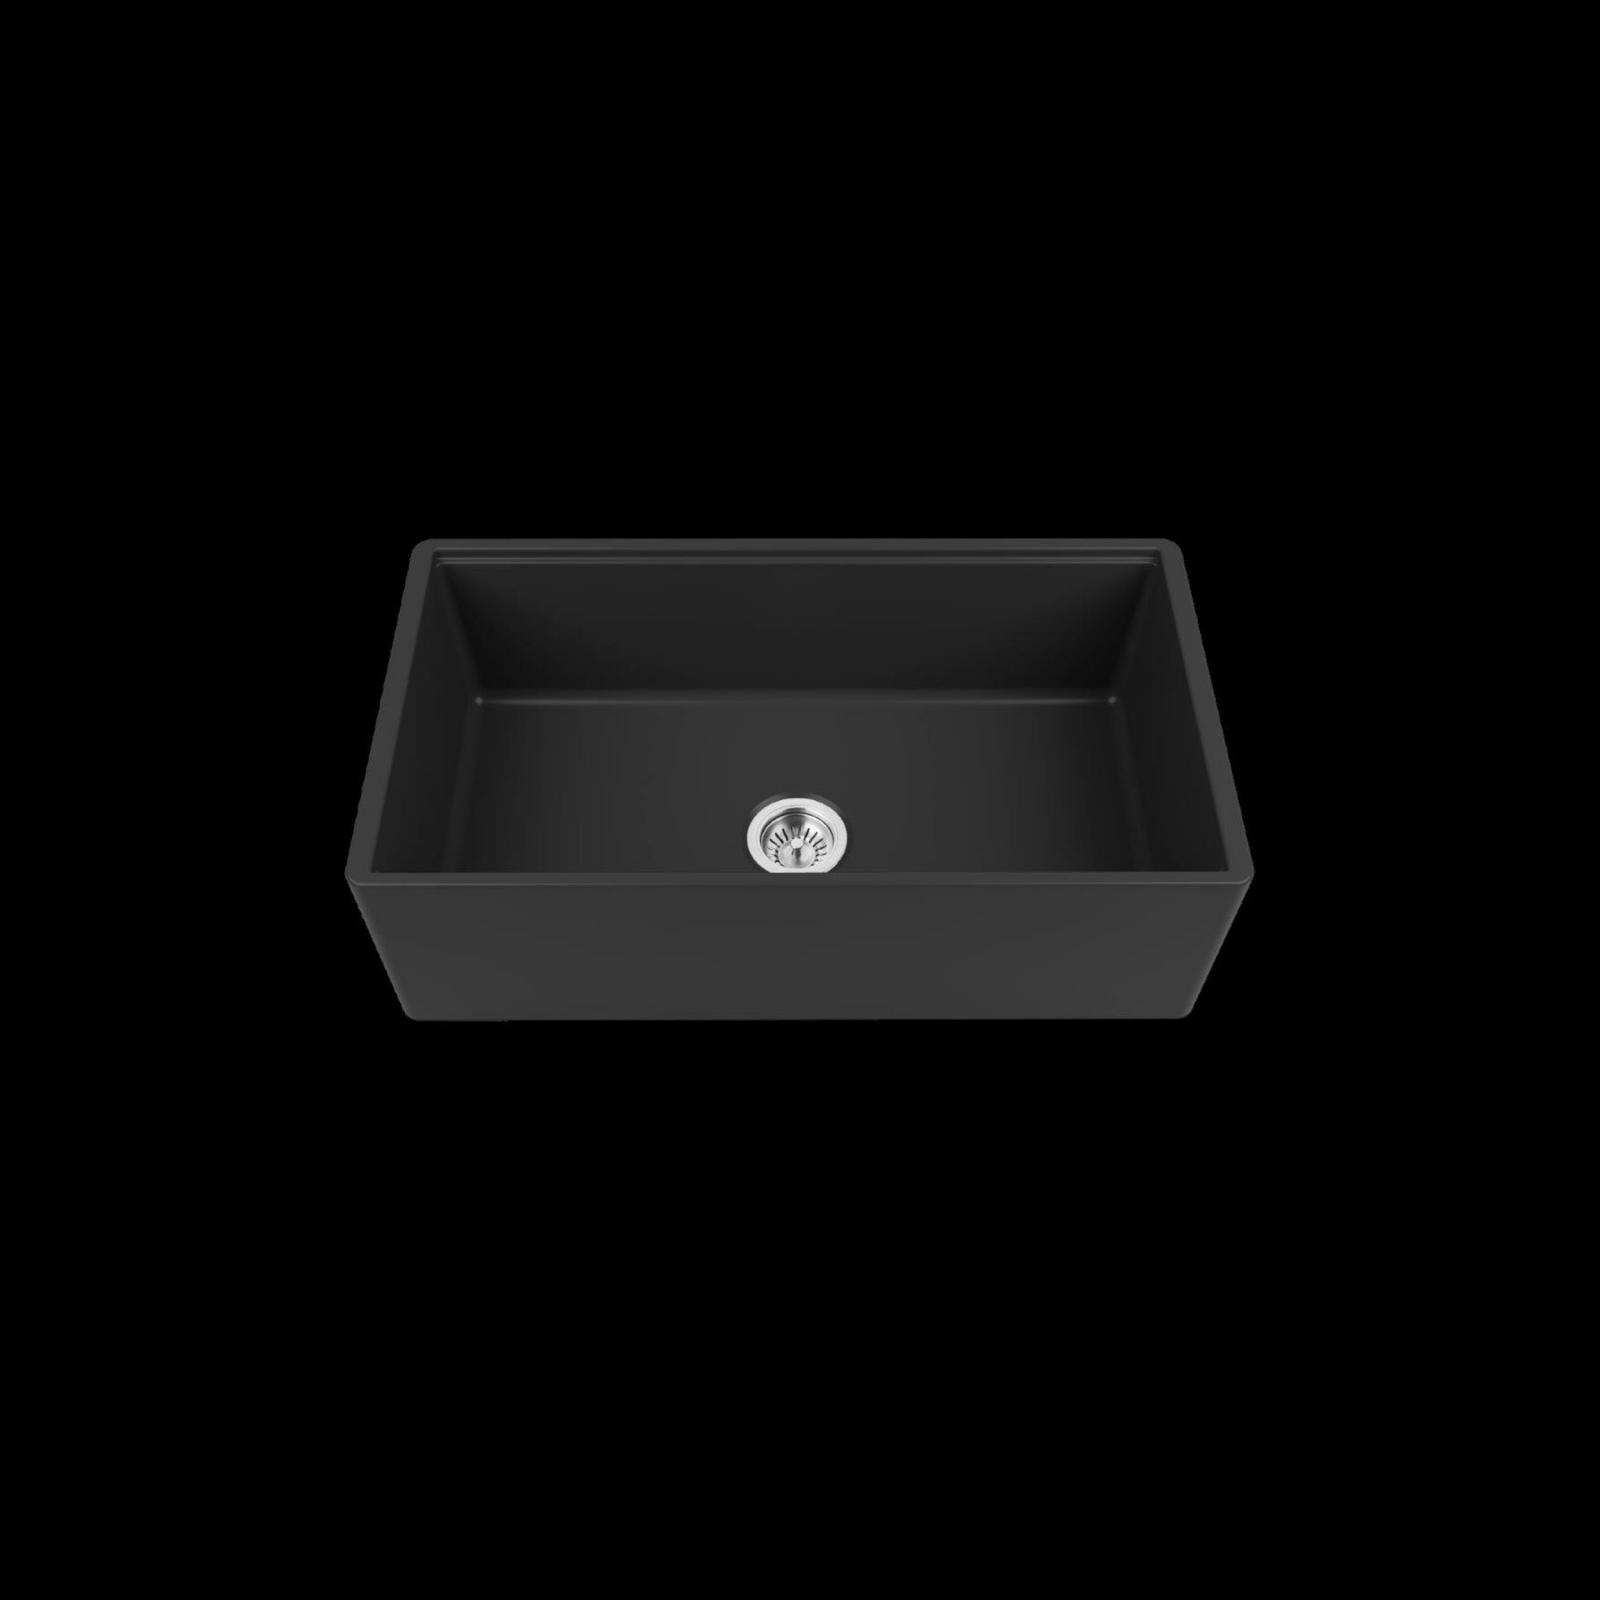 High-quality sink Louis Le Grand III black - single bowl, ceramic - 2